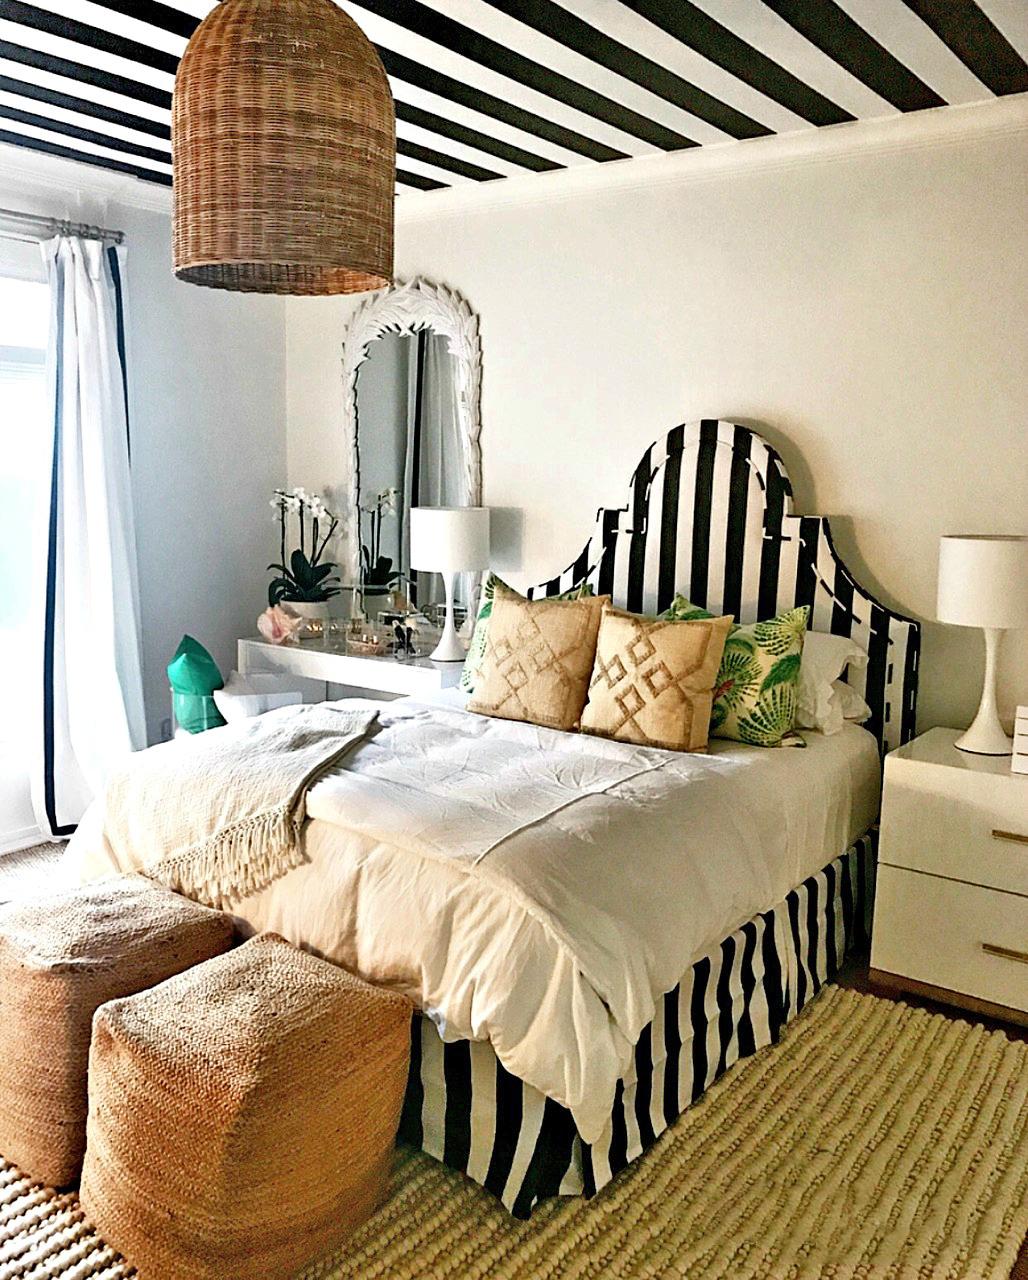 Black & White Striped Ceiling